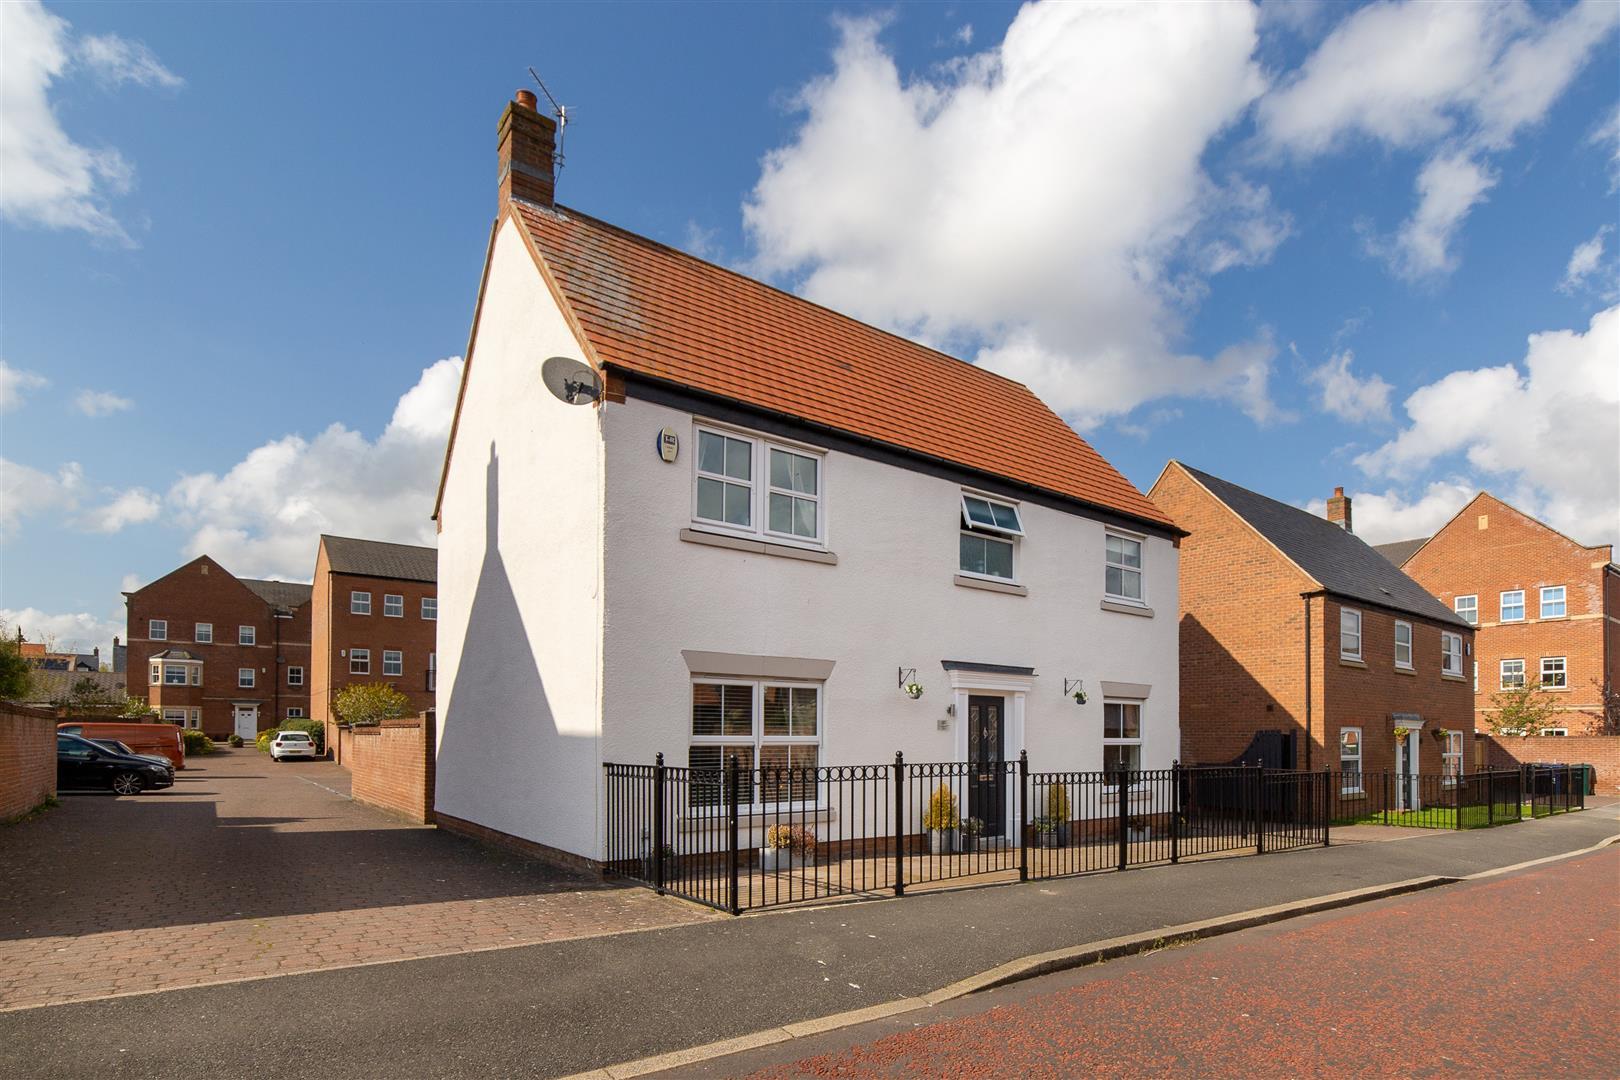 4 bed detached house for sale in Halton Way, Great Park, NE3